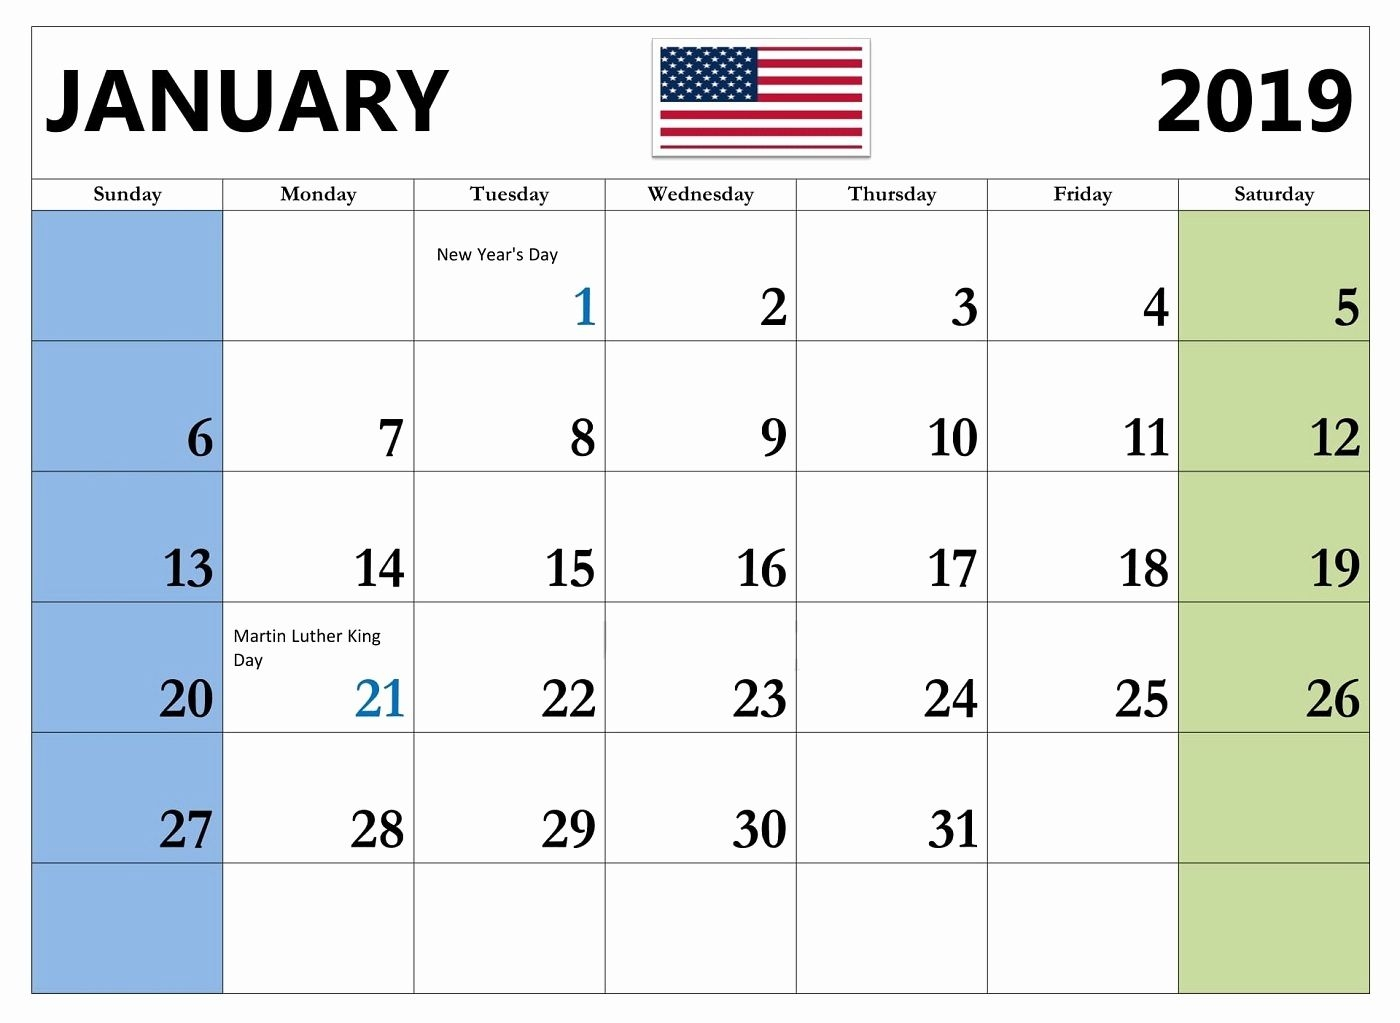 January 2019 Usa Calendar